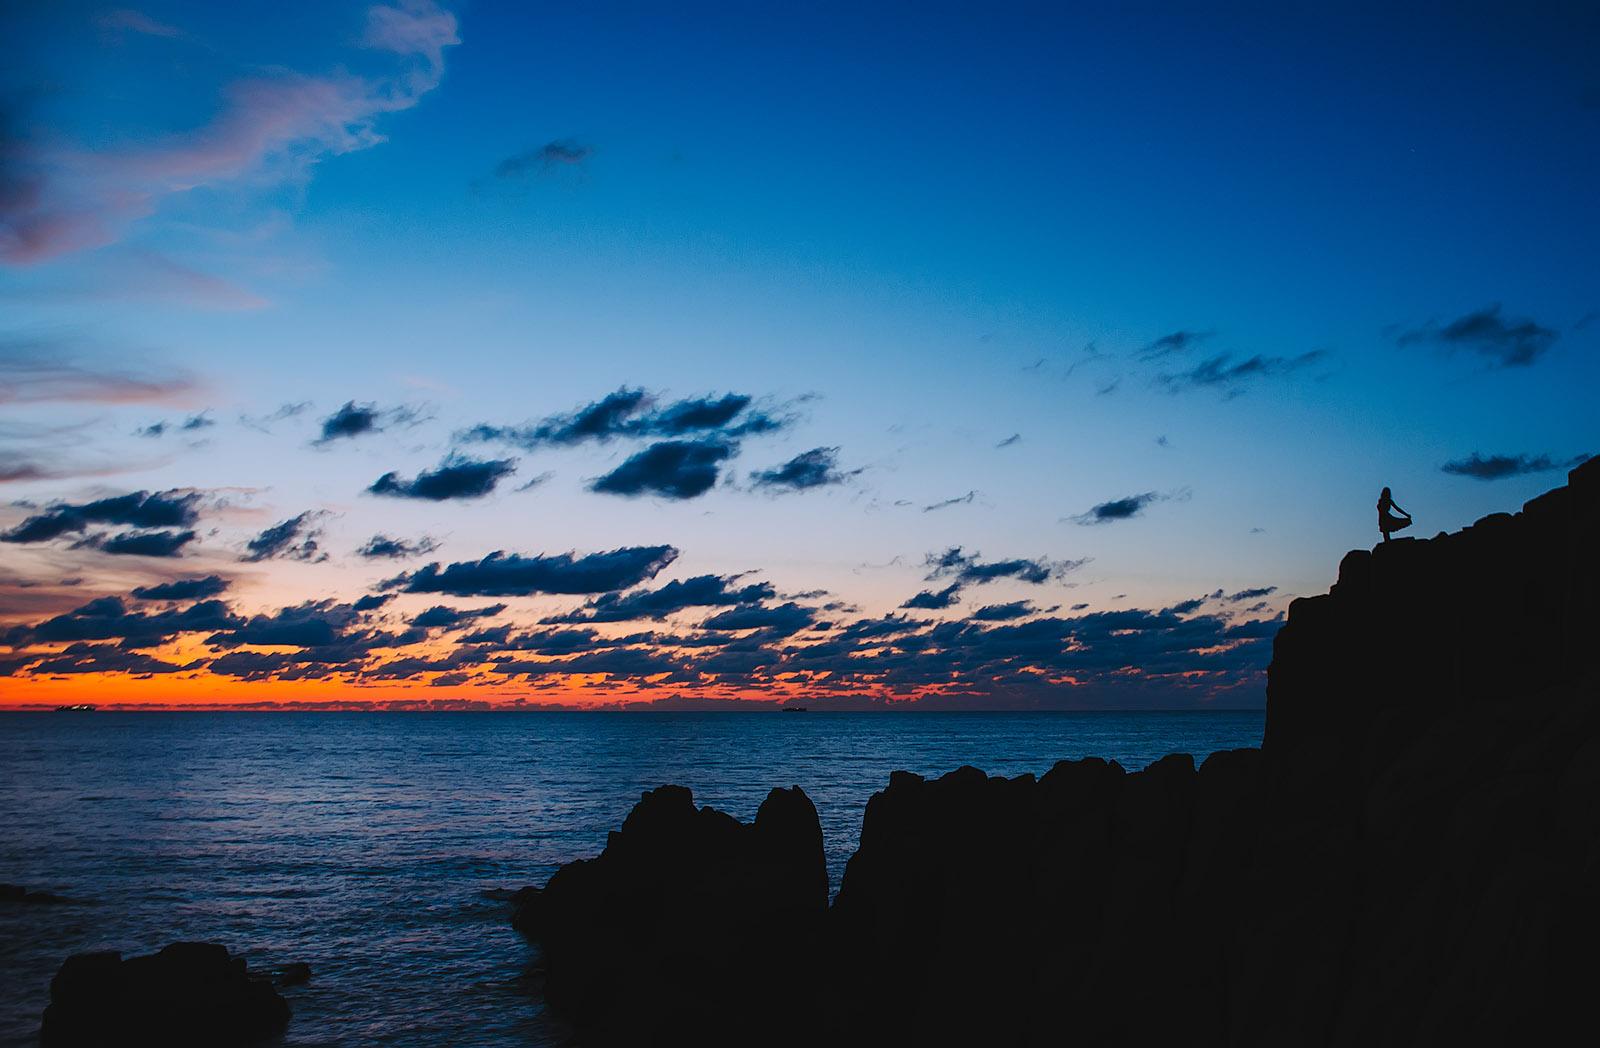 On the sunset